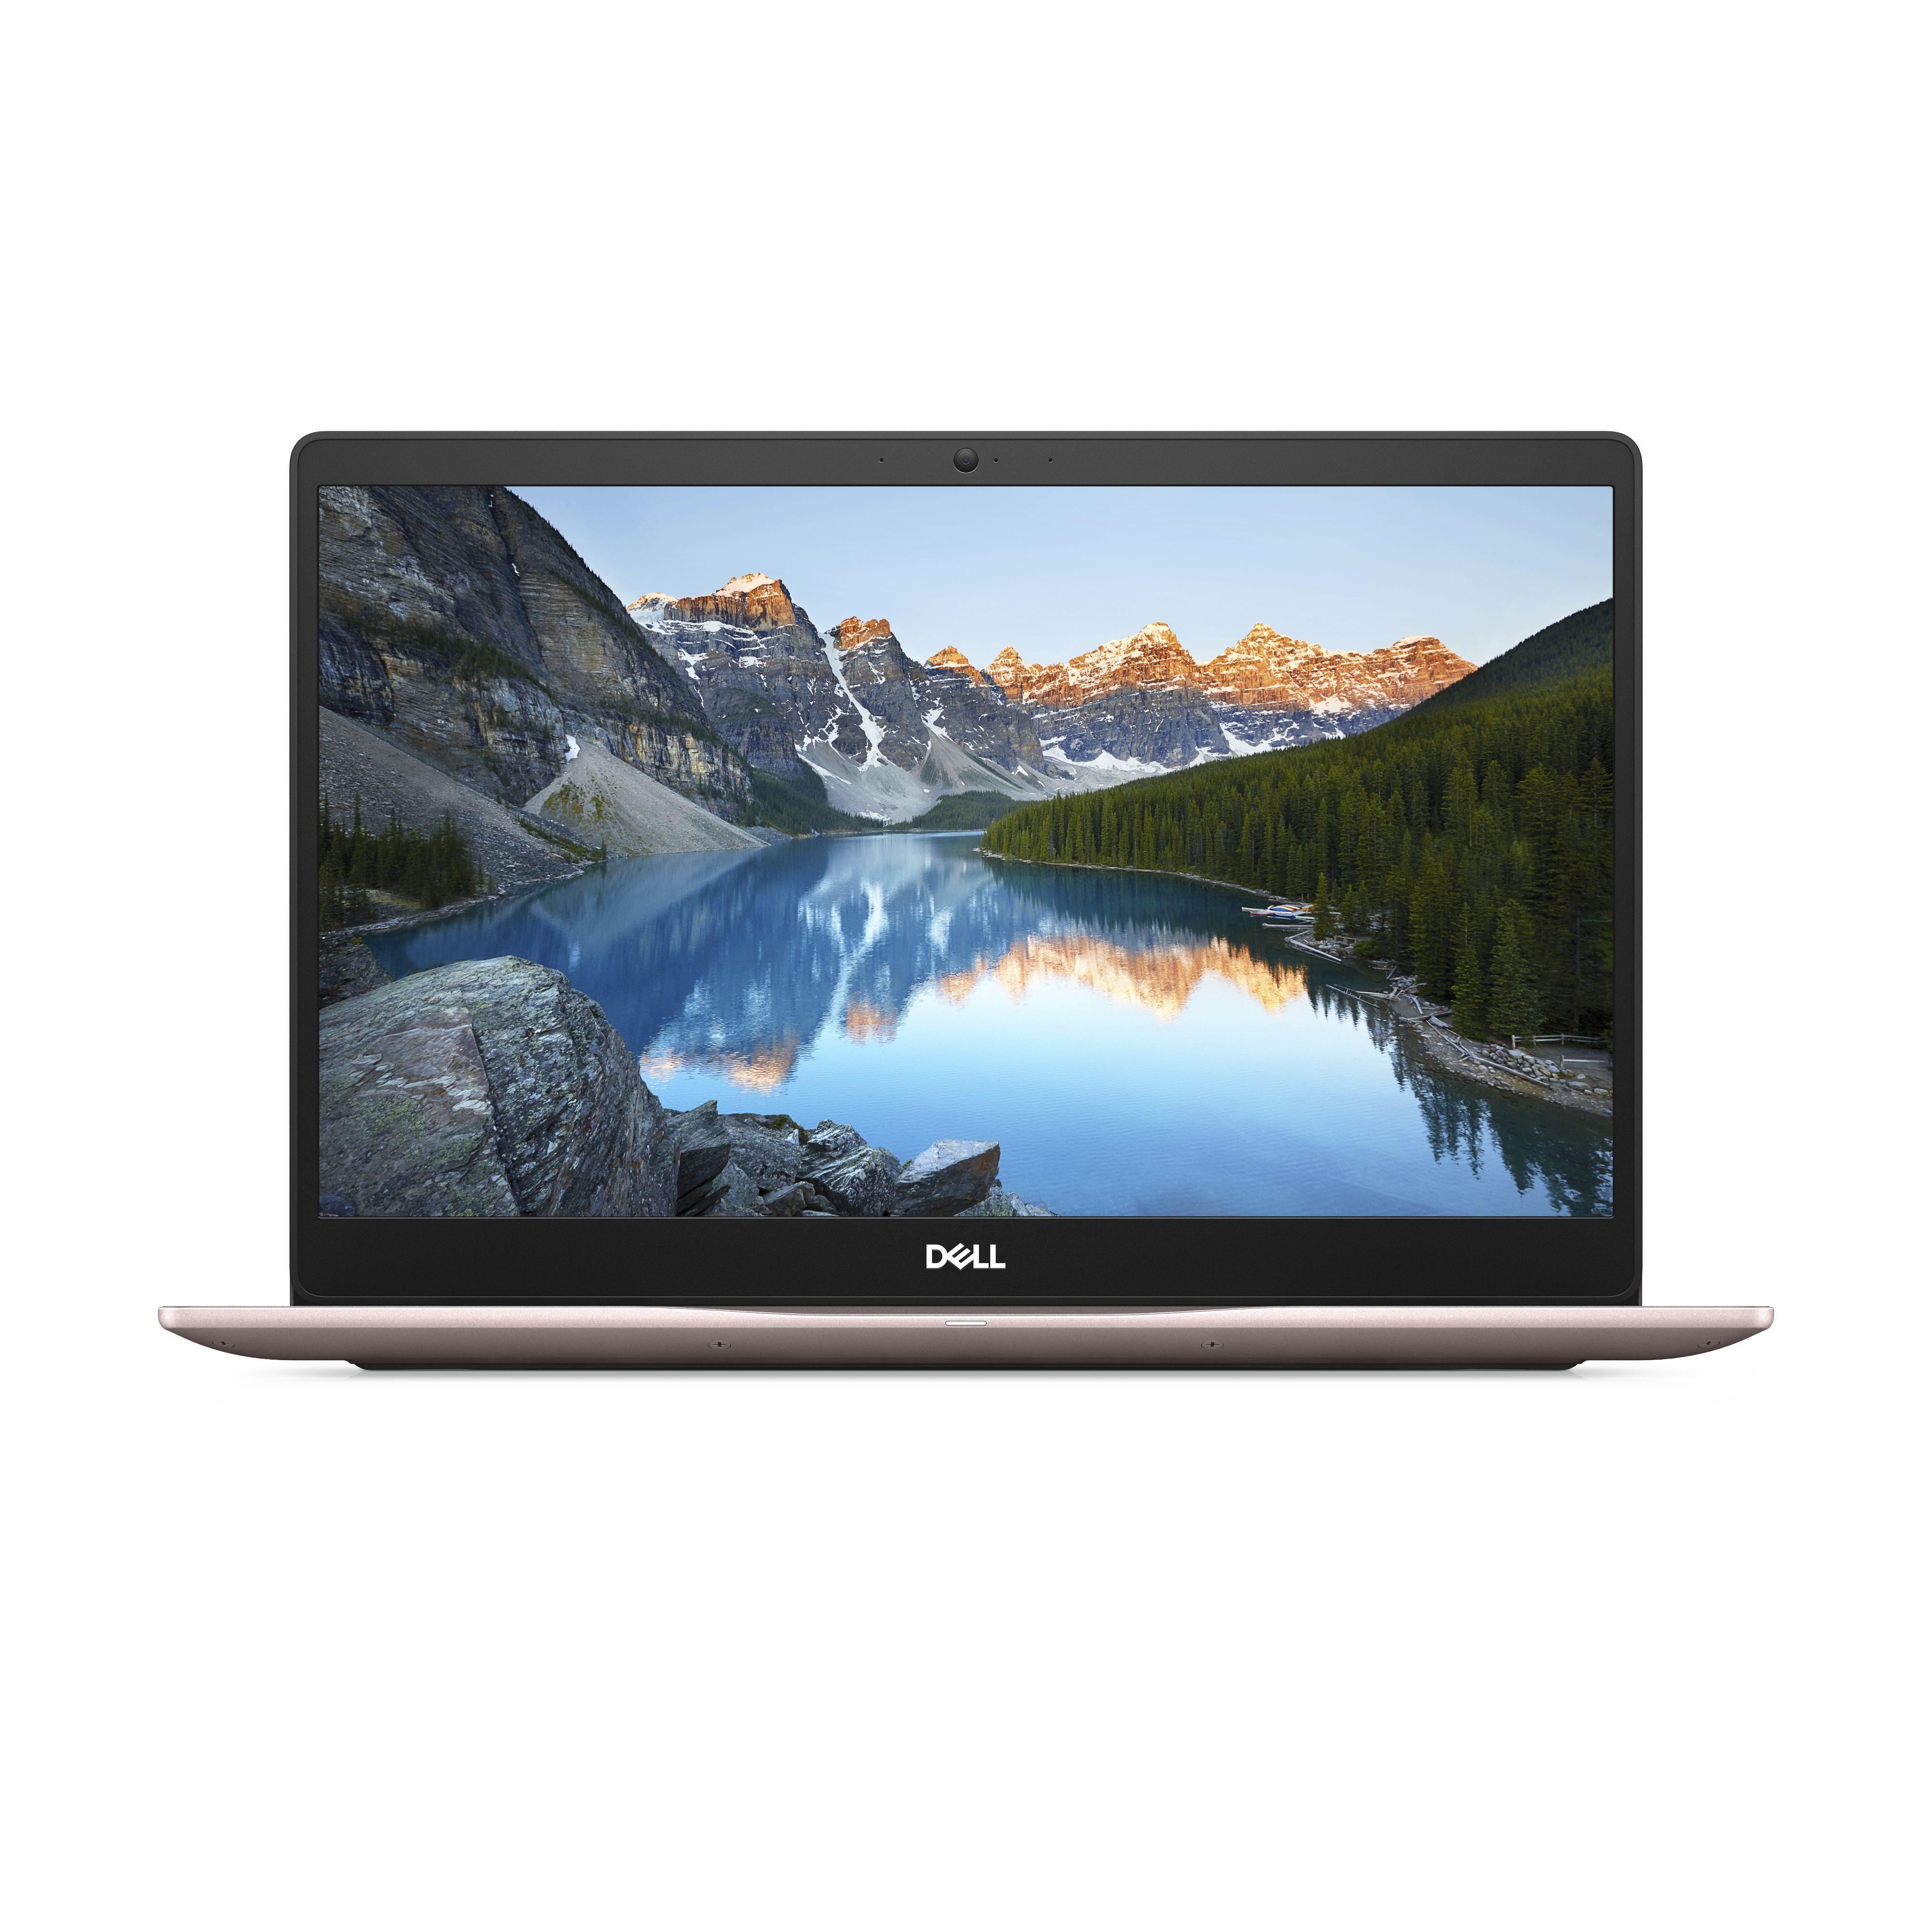 "DELL Inspiron 7570 1.8GHz i7-8550U 15.6"" 1920 x 1080Pixel Oro rosa Computer portatile"